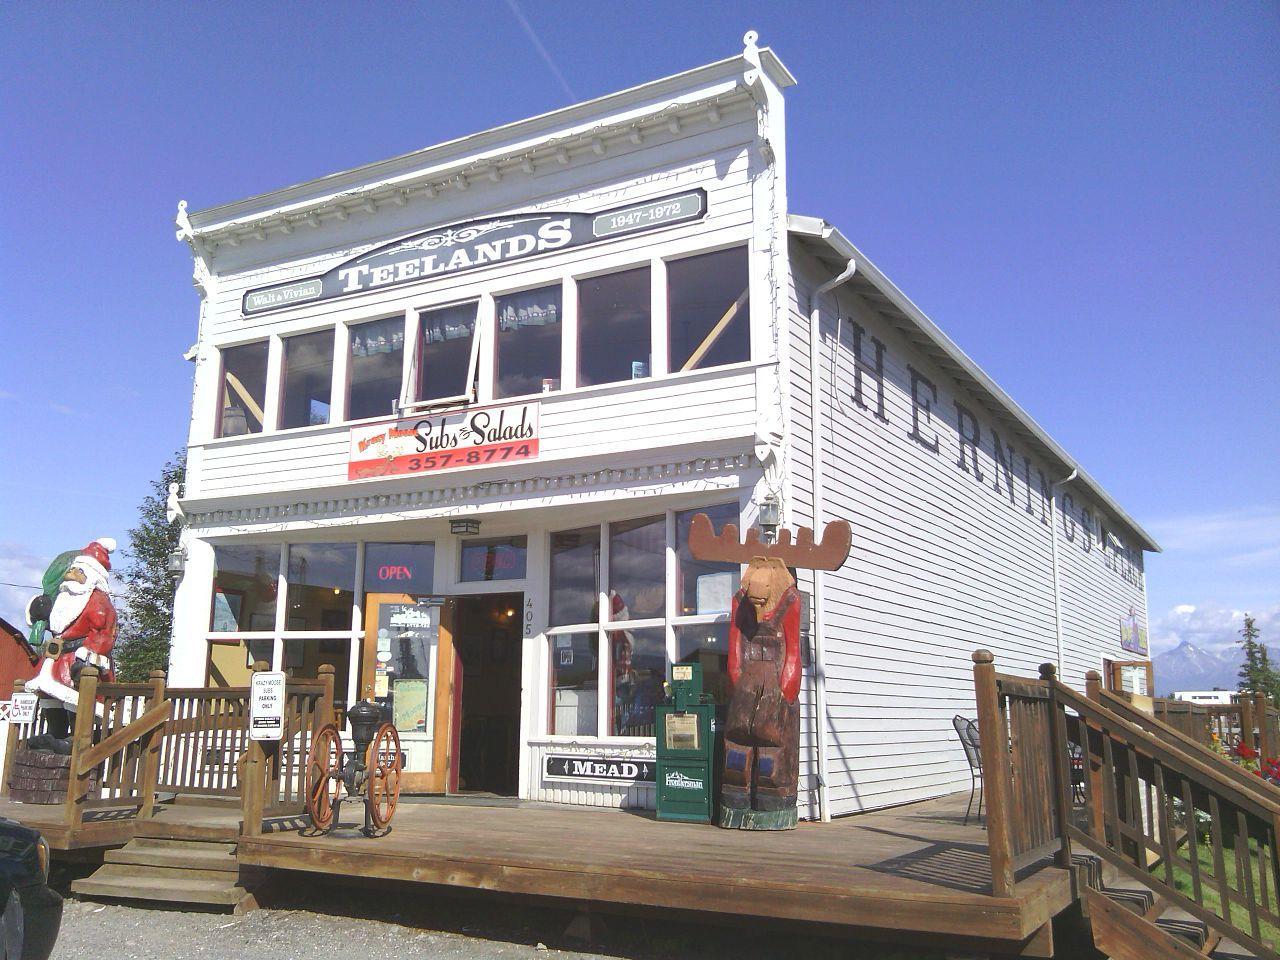 Teeland S Country Store In Matanaska Sustina Alaska Palmer